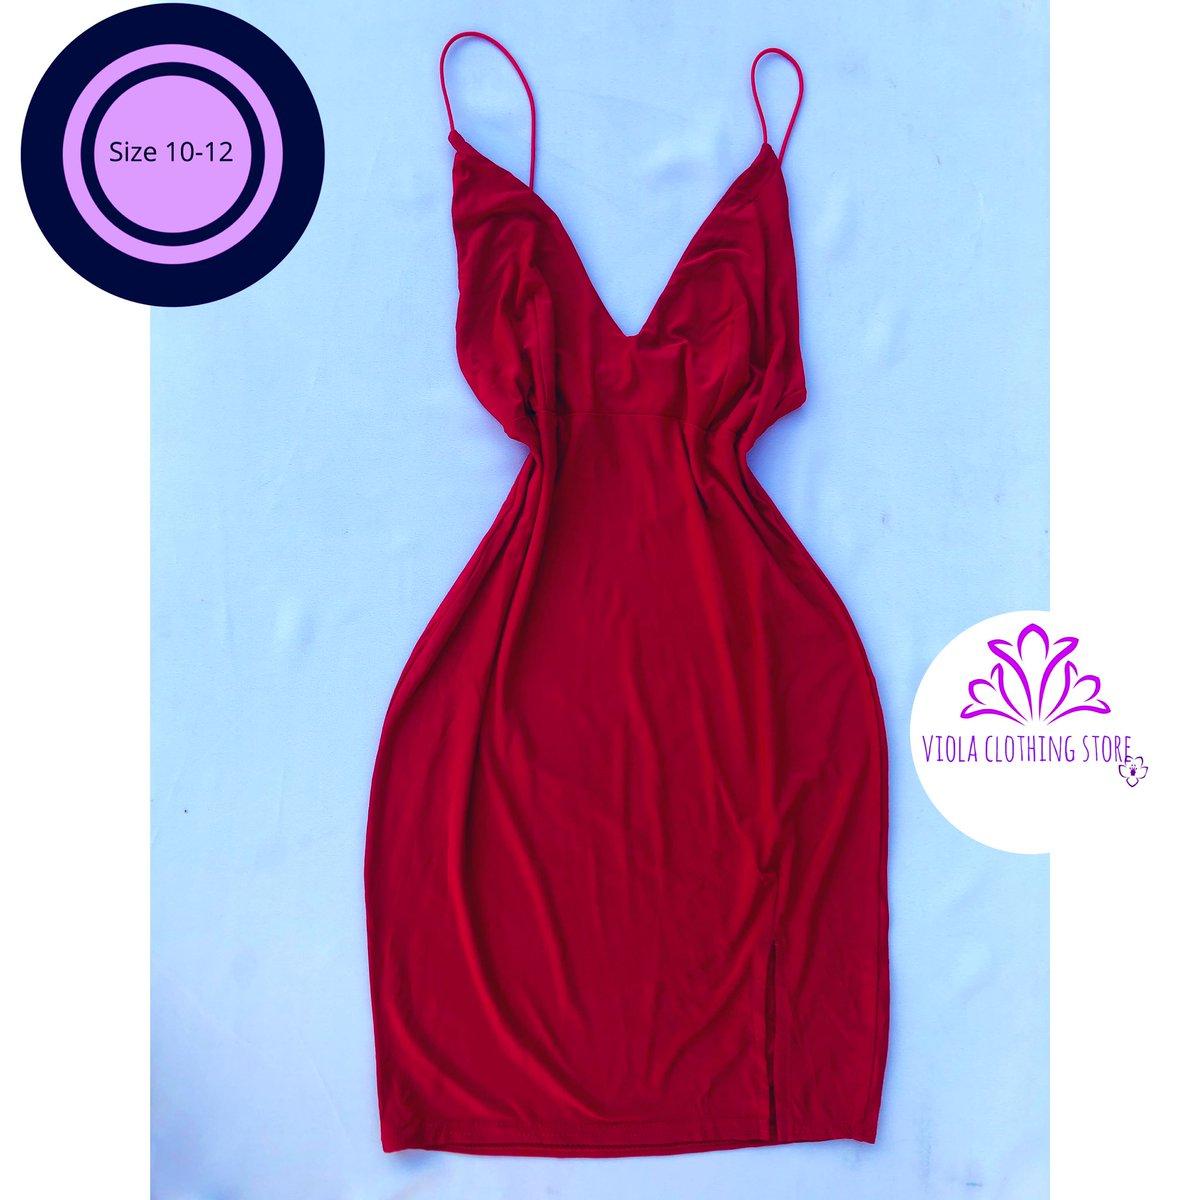 .Please like and retweet🙏🏾 .📌Thrifted  . 📌Beautiful short bodycon dress .📌price: 2300 .📌size: 10-12 #AbujaTwitterCommunity #Nigeria #violaclothingstore #Abuja #ValentinesDay2020 #dress #lagos #thriftstore https://t.co/1haQyzDNN5